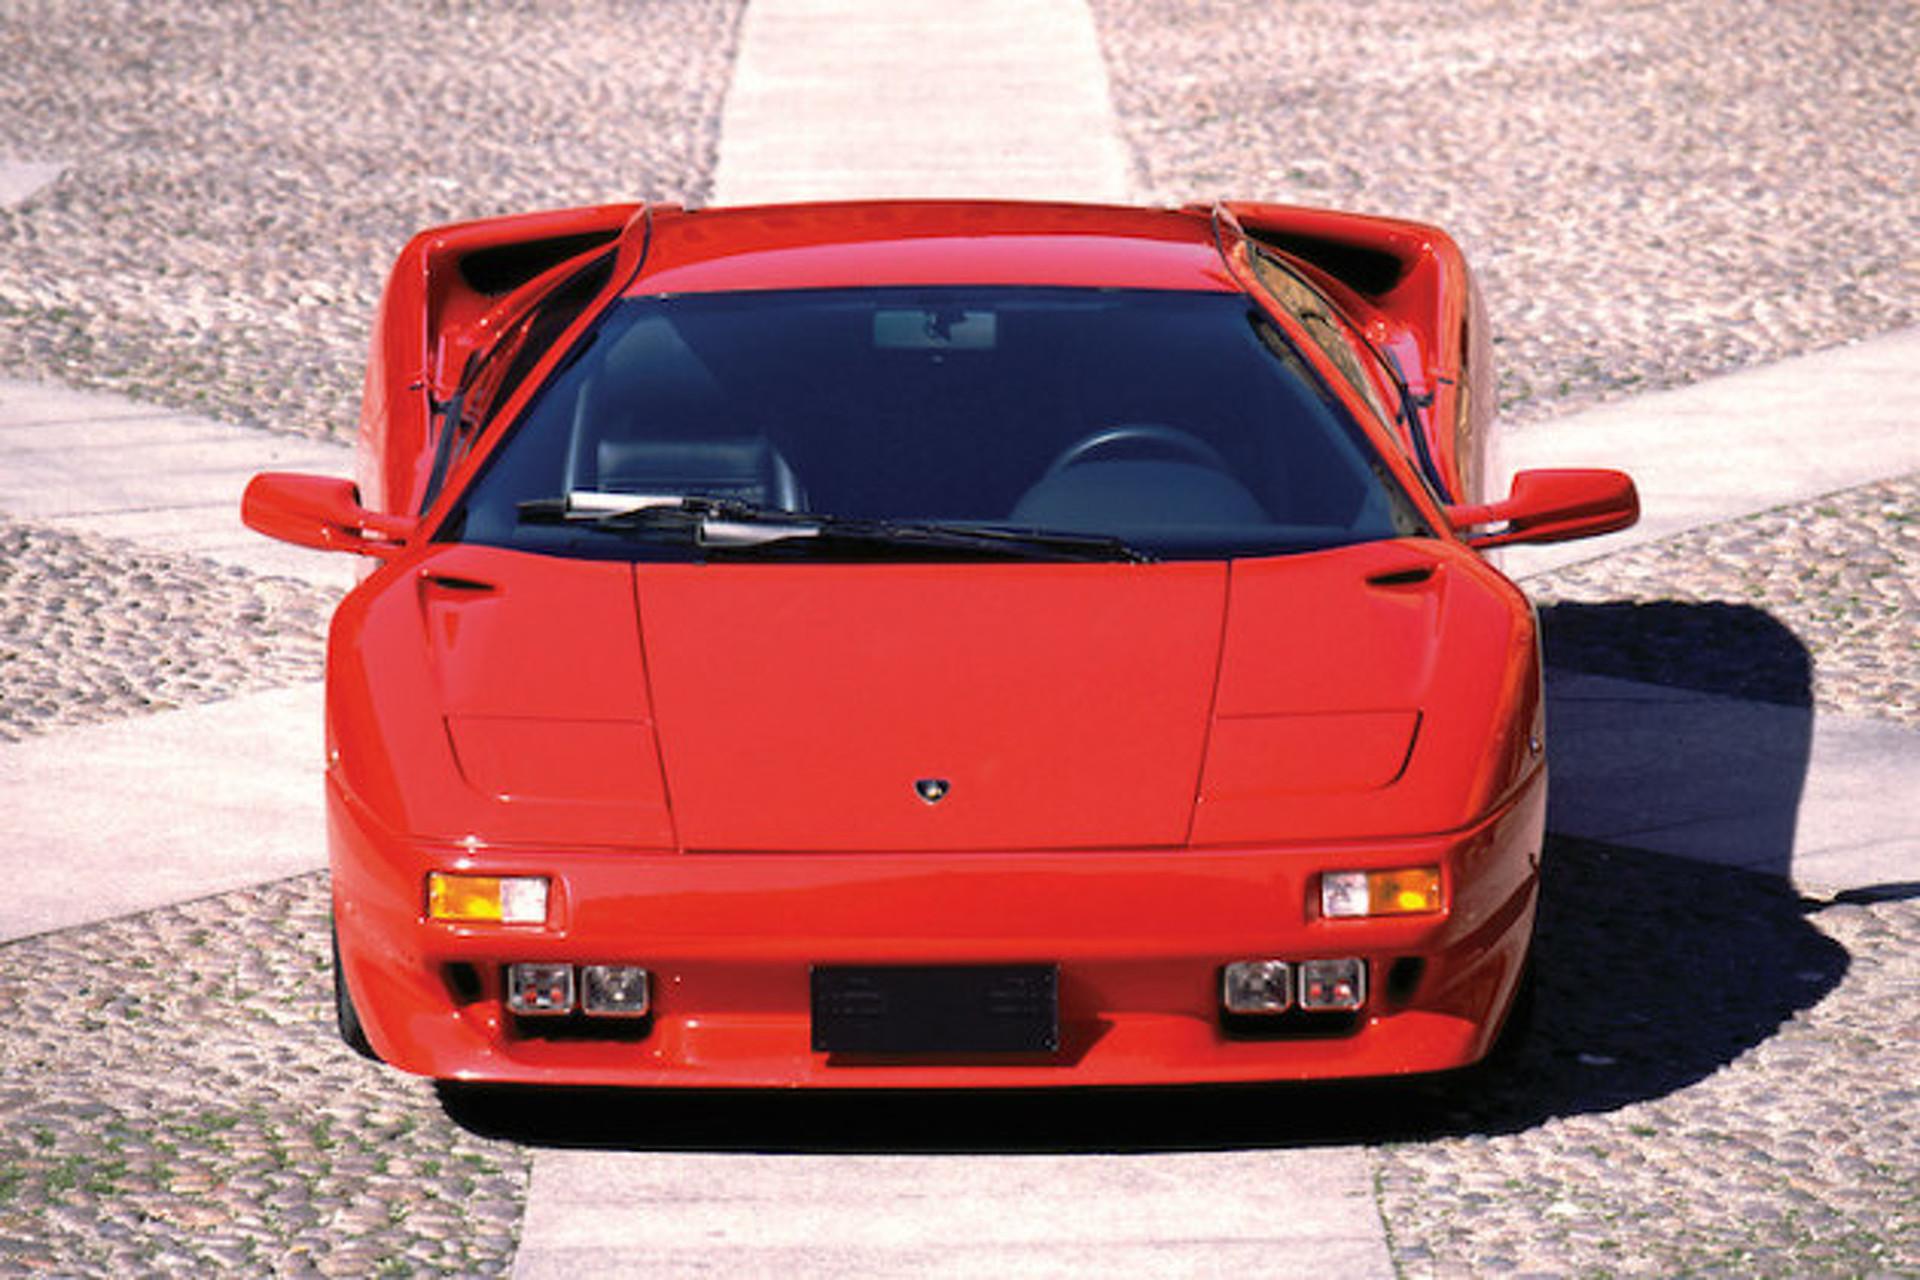 Lamborghini Diablo: Born in Italy, Designed in Detroit